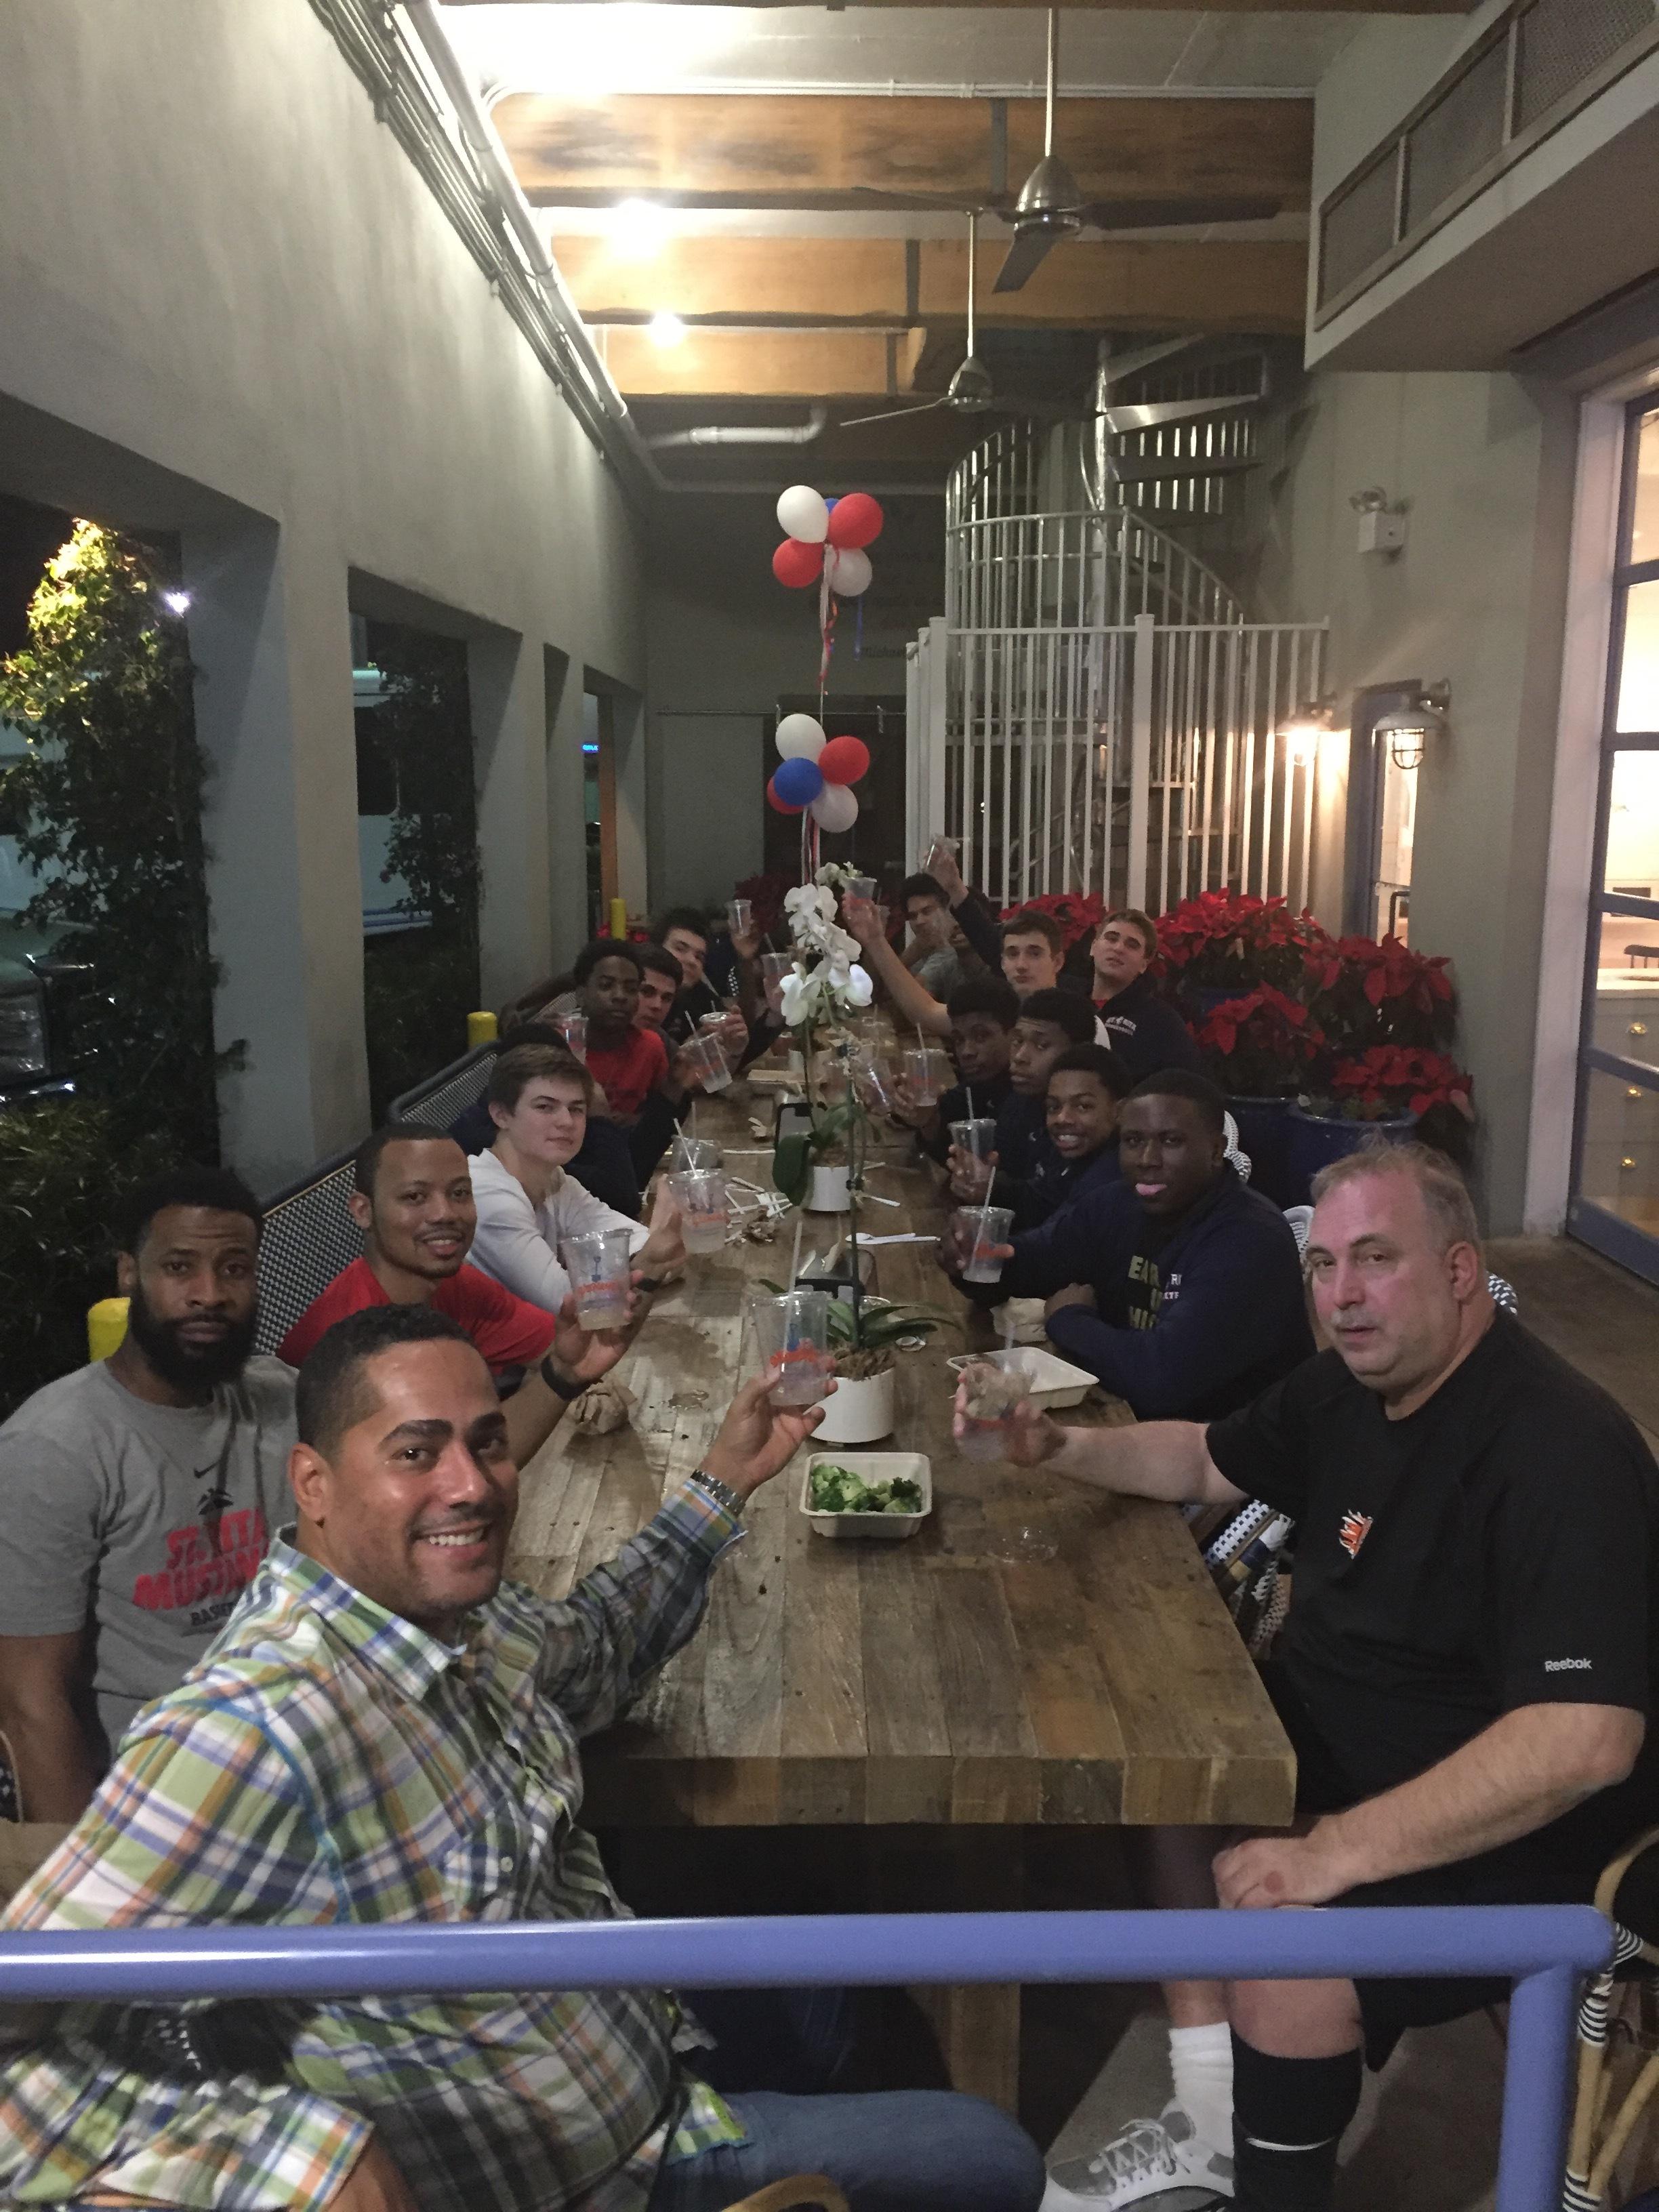 St. Rita Basketball team dinner at Ray Allen's restaurant Grown